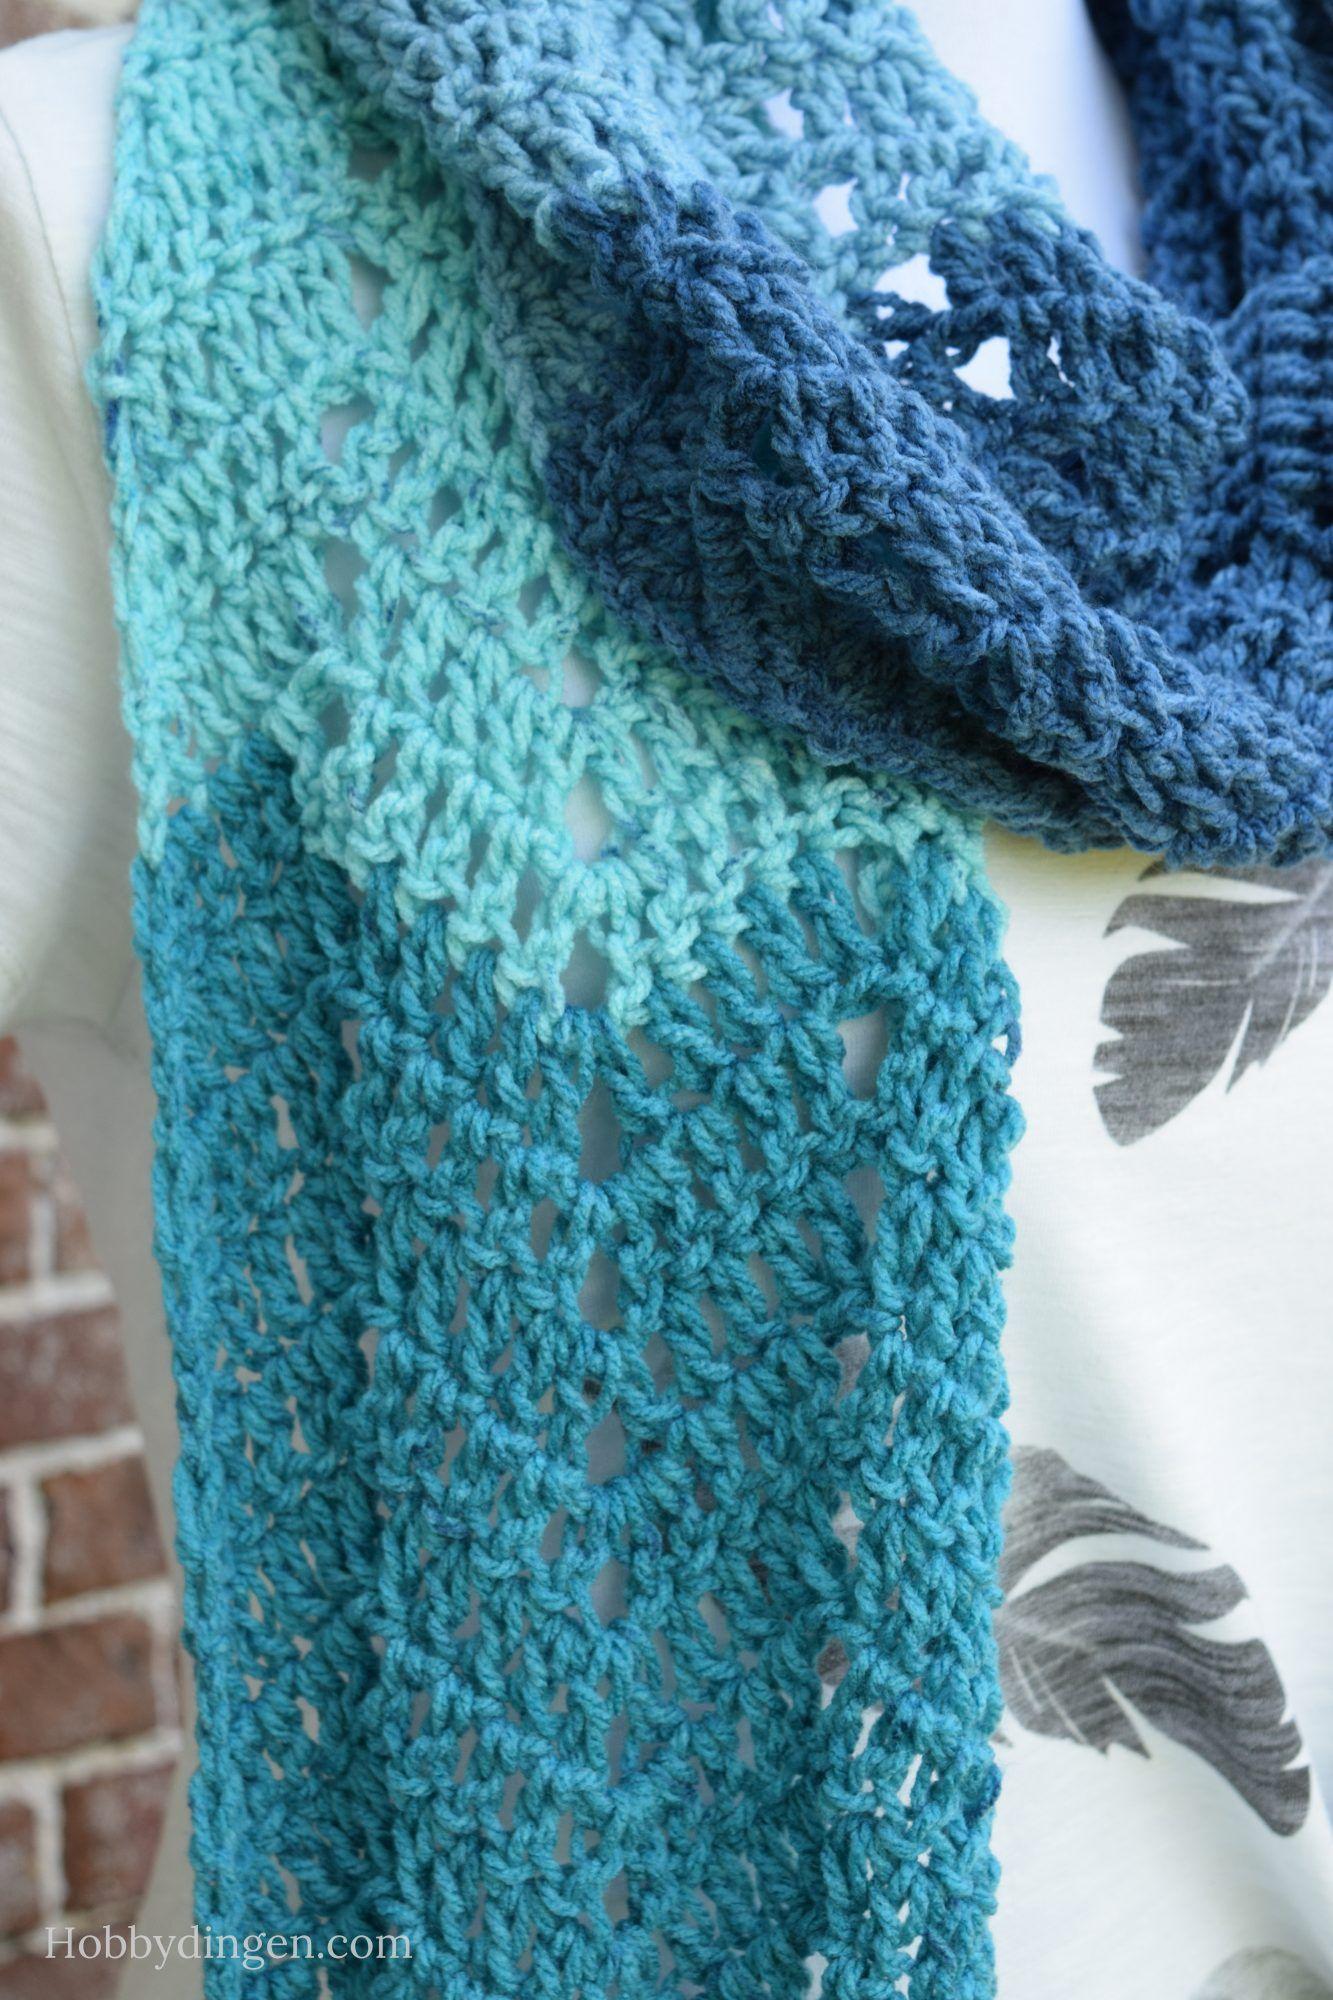 Free Crochet Pattern: Waterfall Scarf - Hobbydingen.com | Craft ...